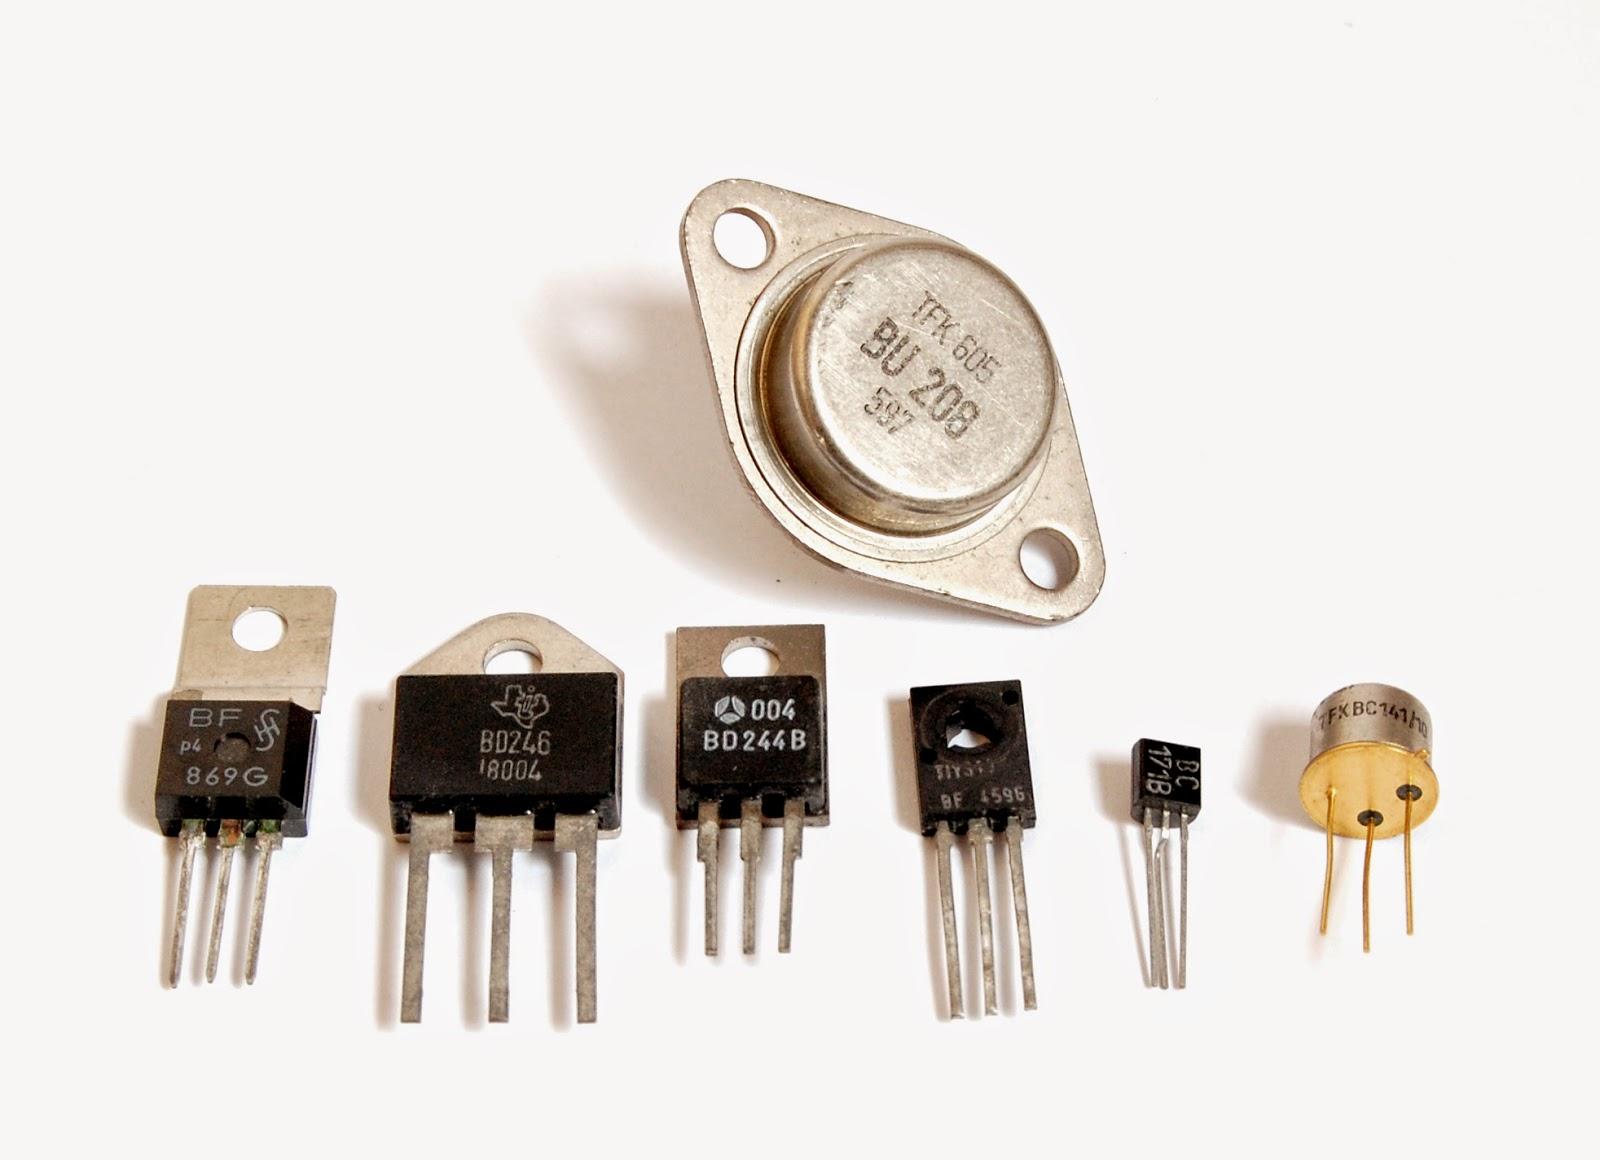 macam-macam transistor komponen elektronika